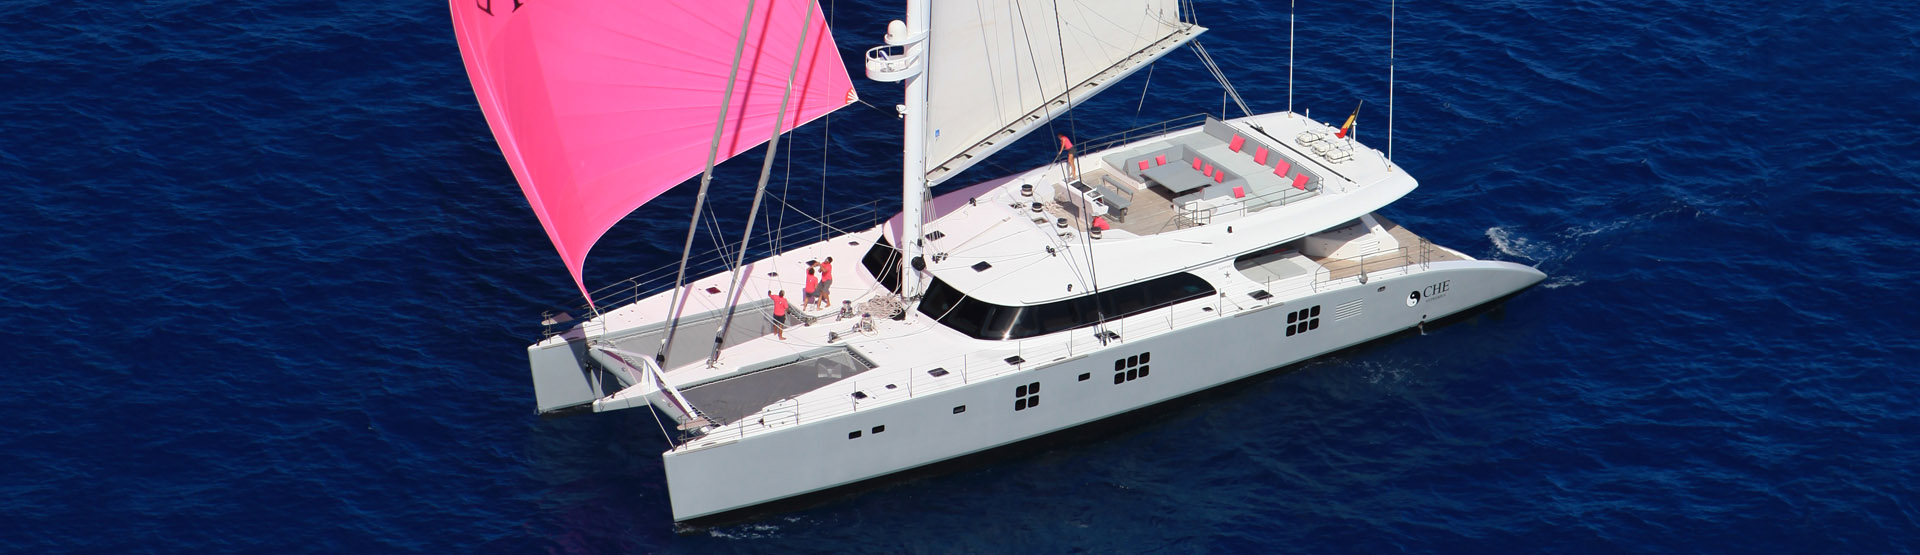 Sailing yacht CHE